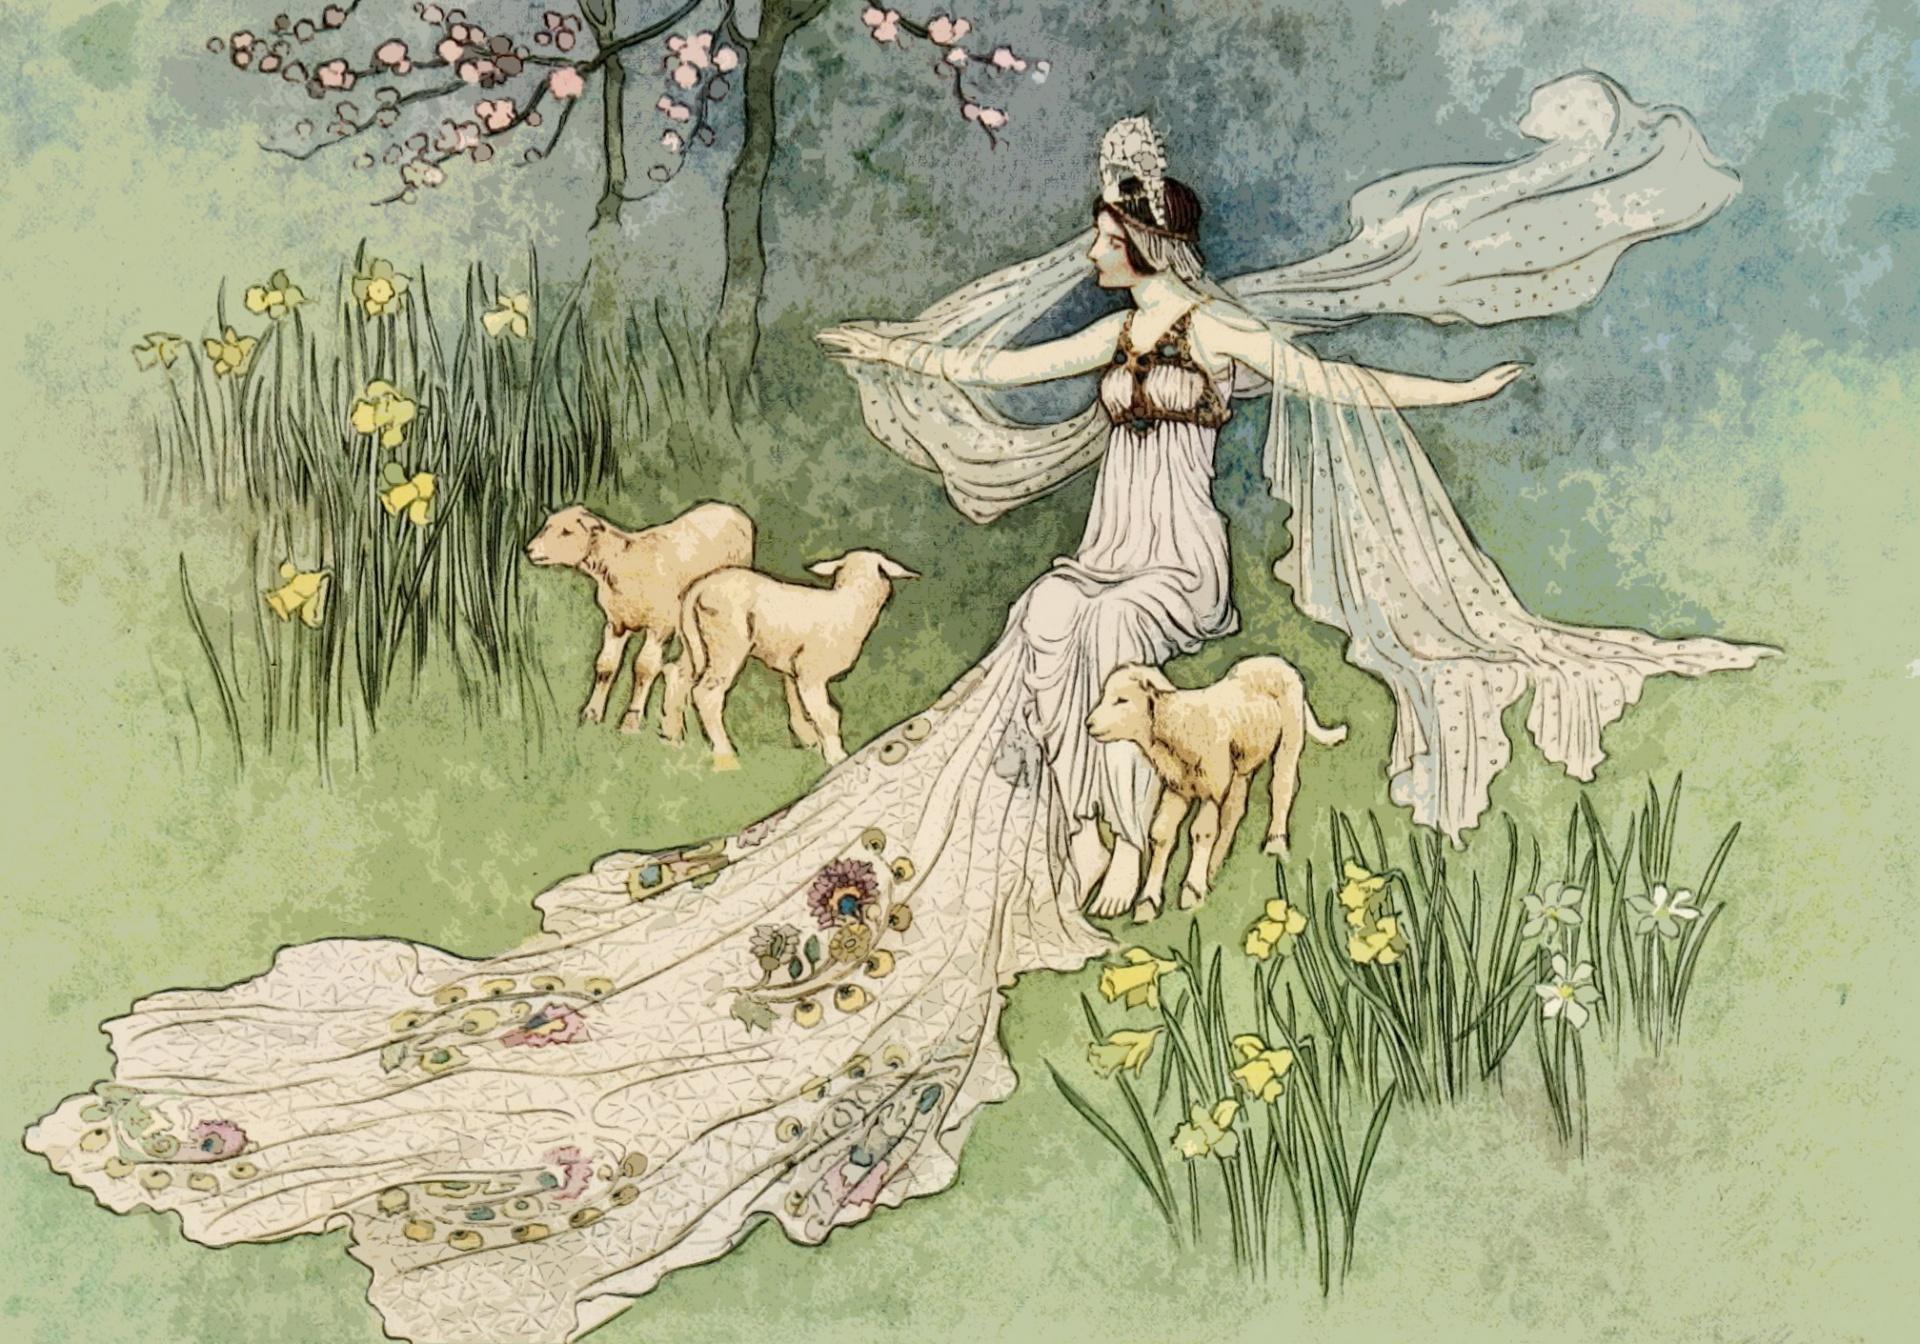 Fairy tail illustration. Clipart clip art graphic